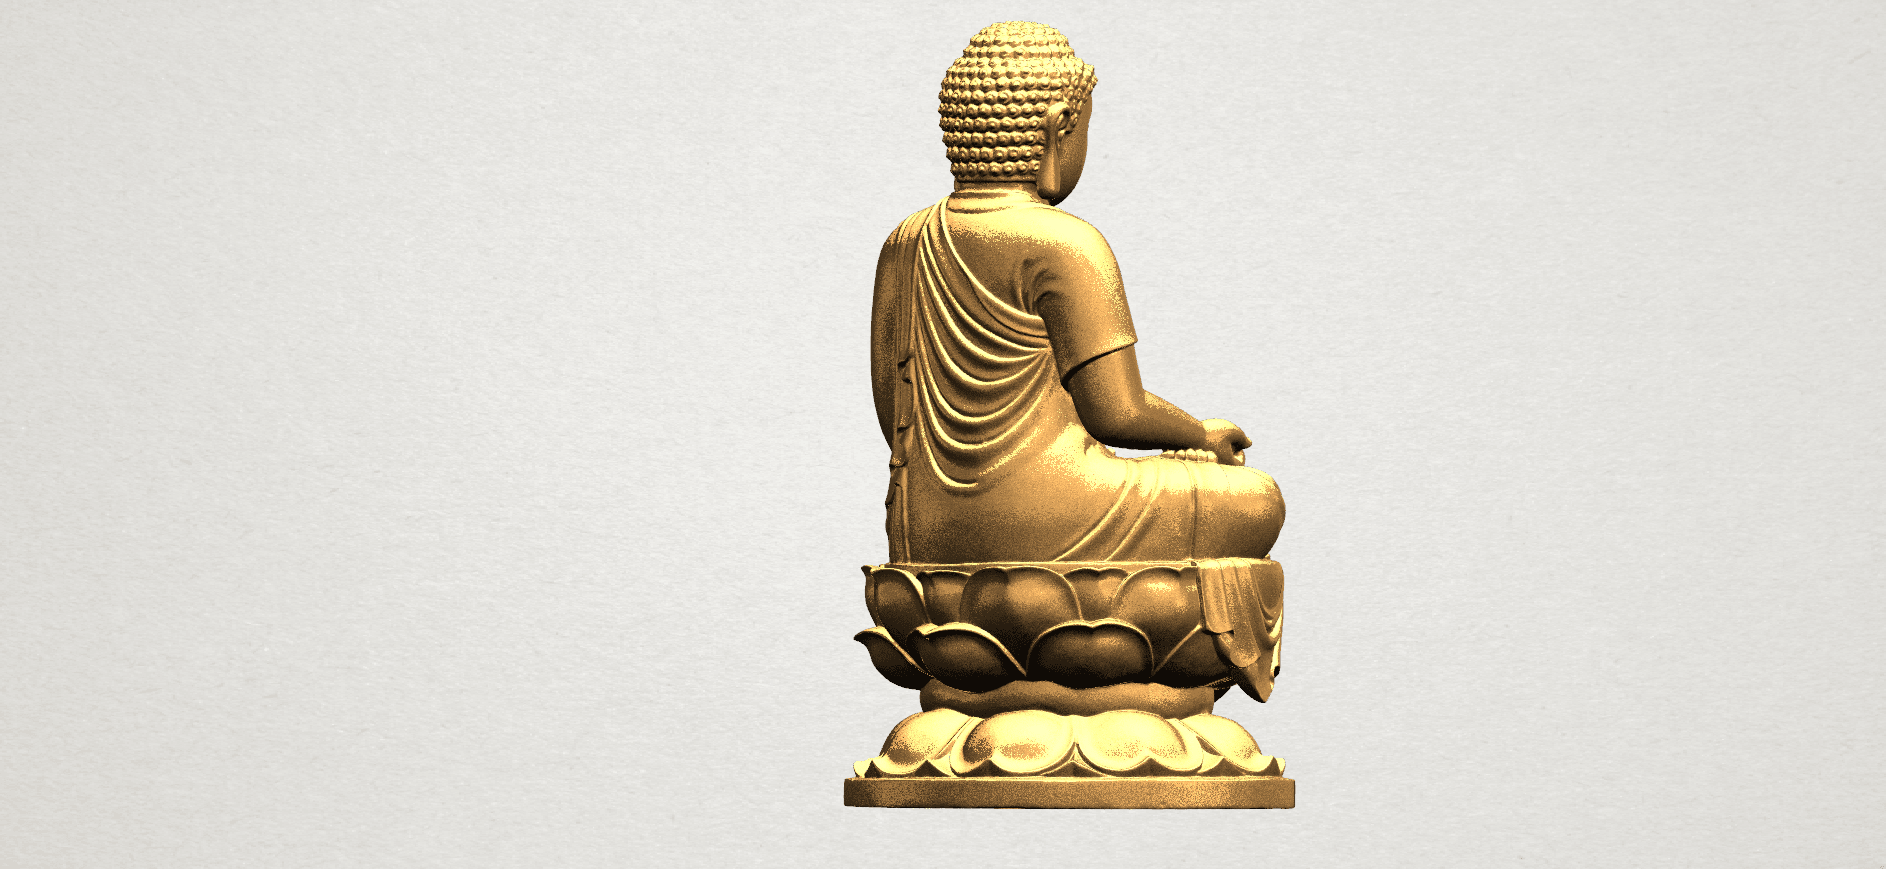 Gautama Buddha (ii) A06.png Download free STL file Gautama Buddha 02 • 3D print template, GeorgesNikkei